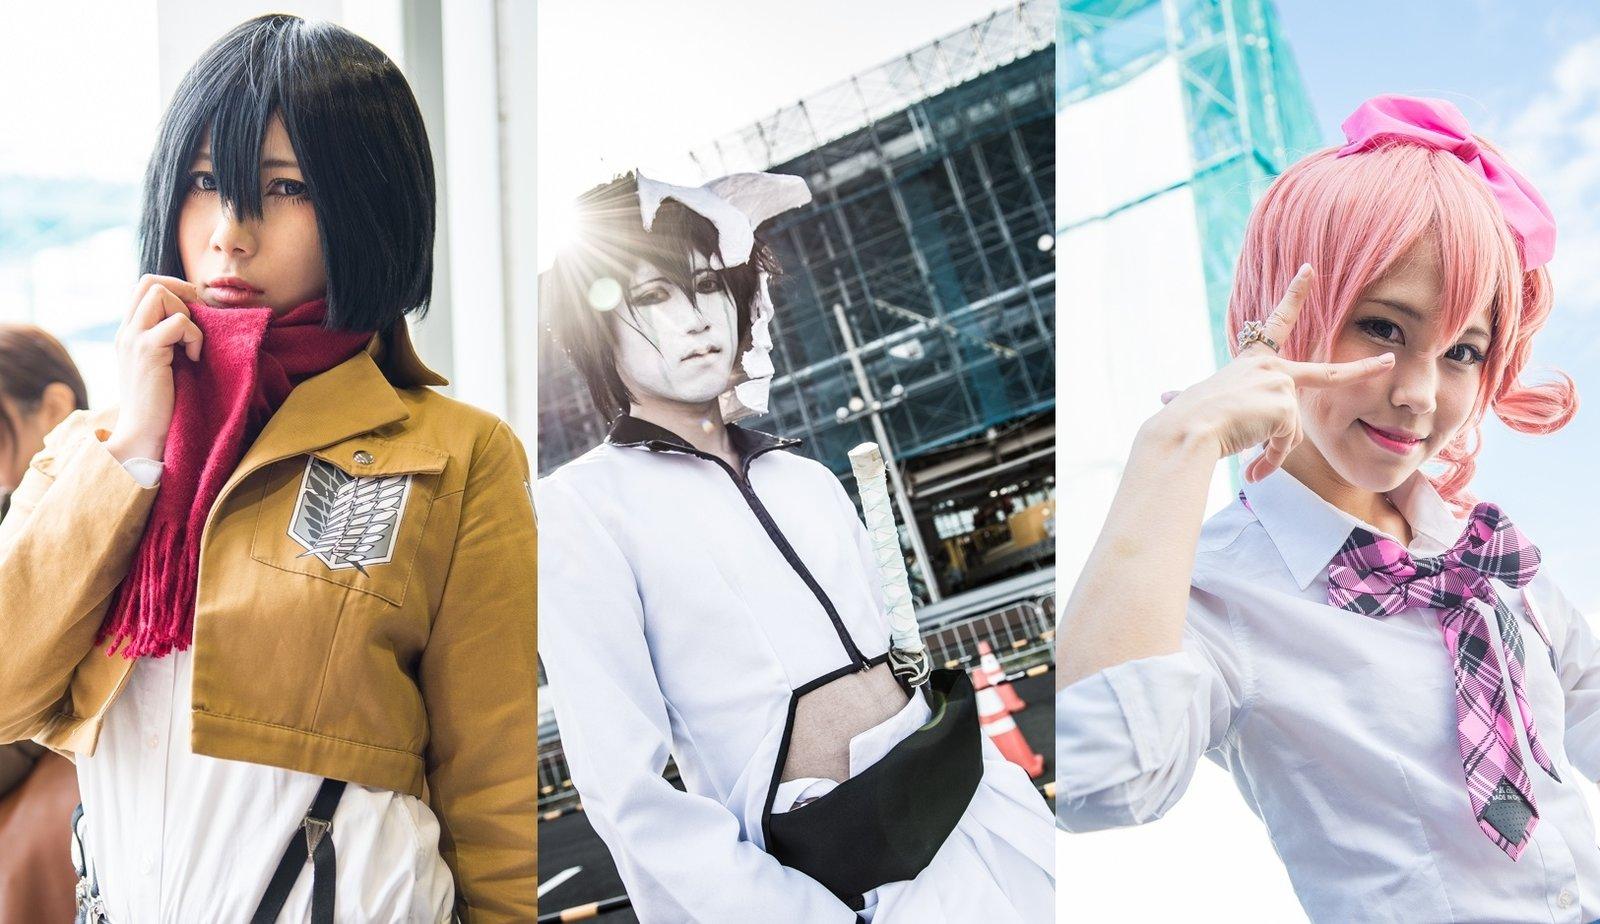 Anime Japan 2016 Event Report